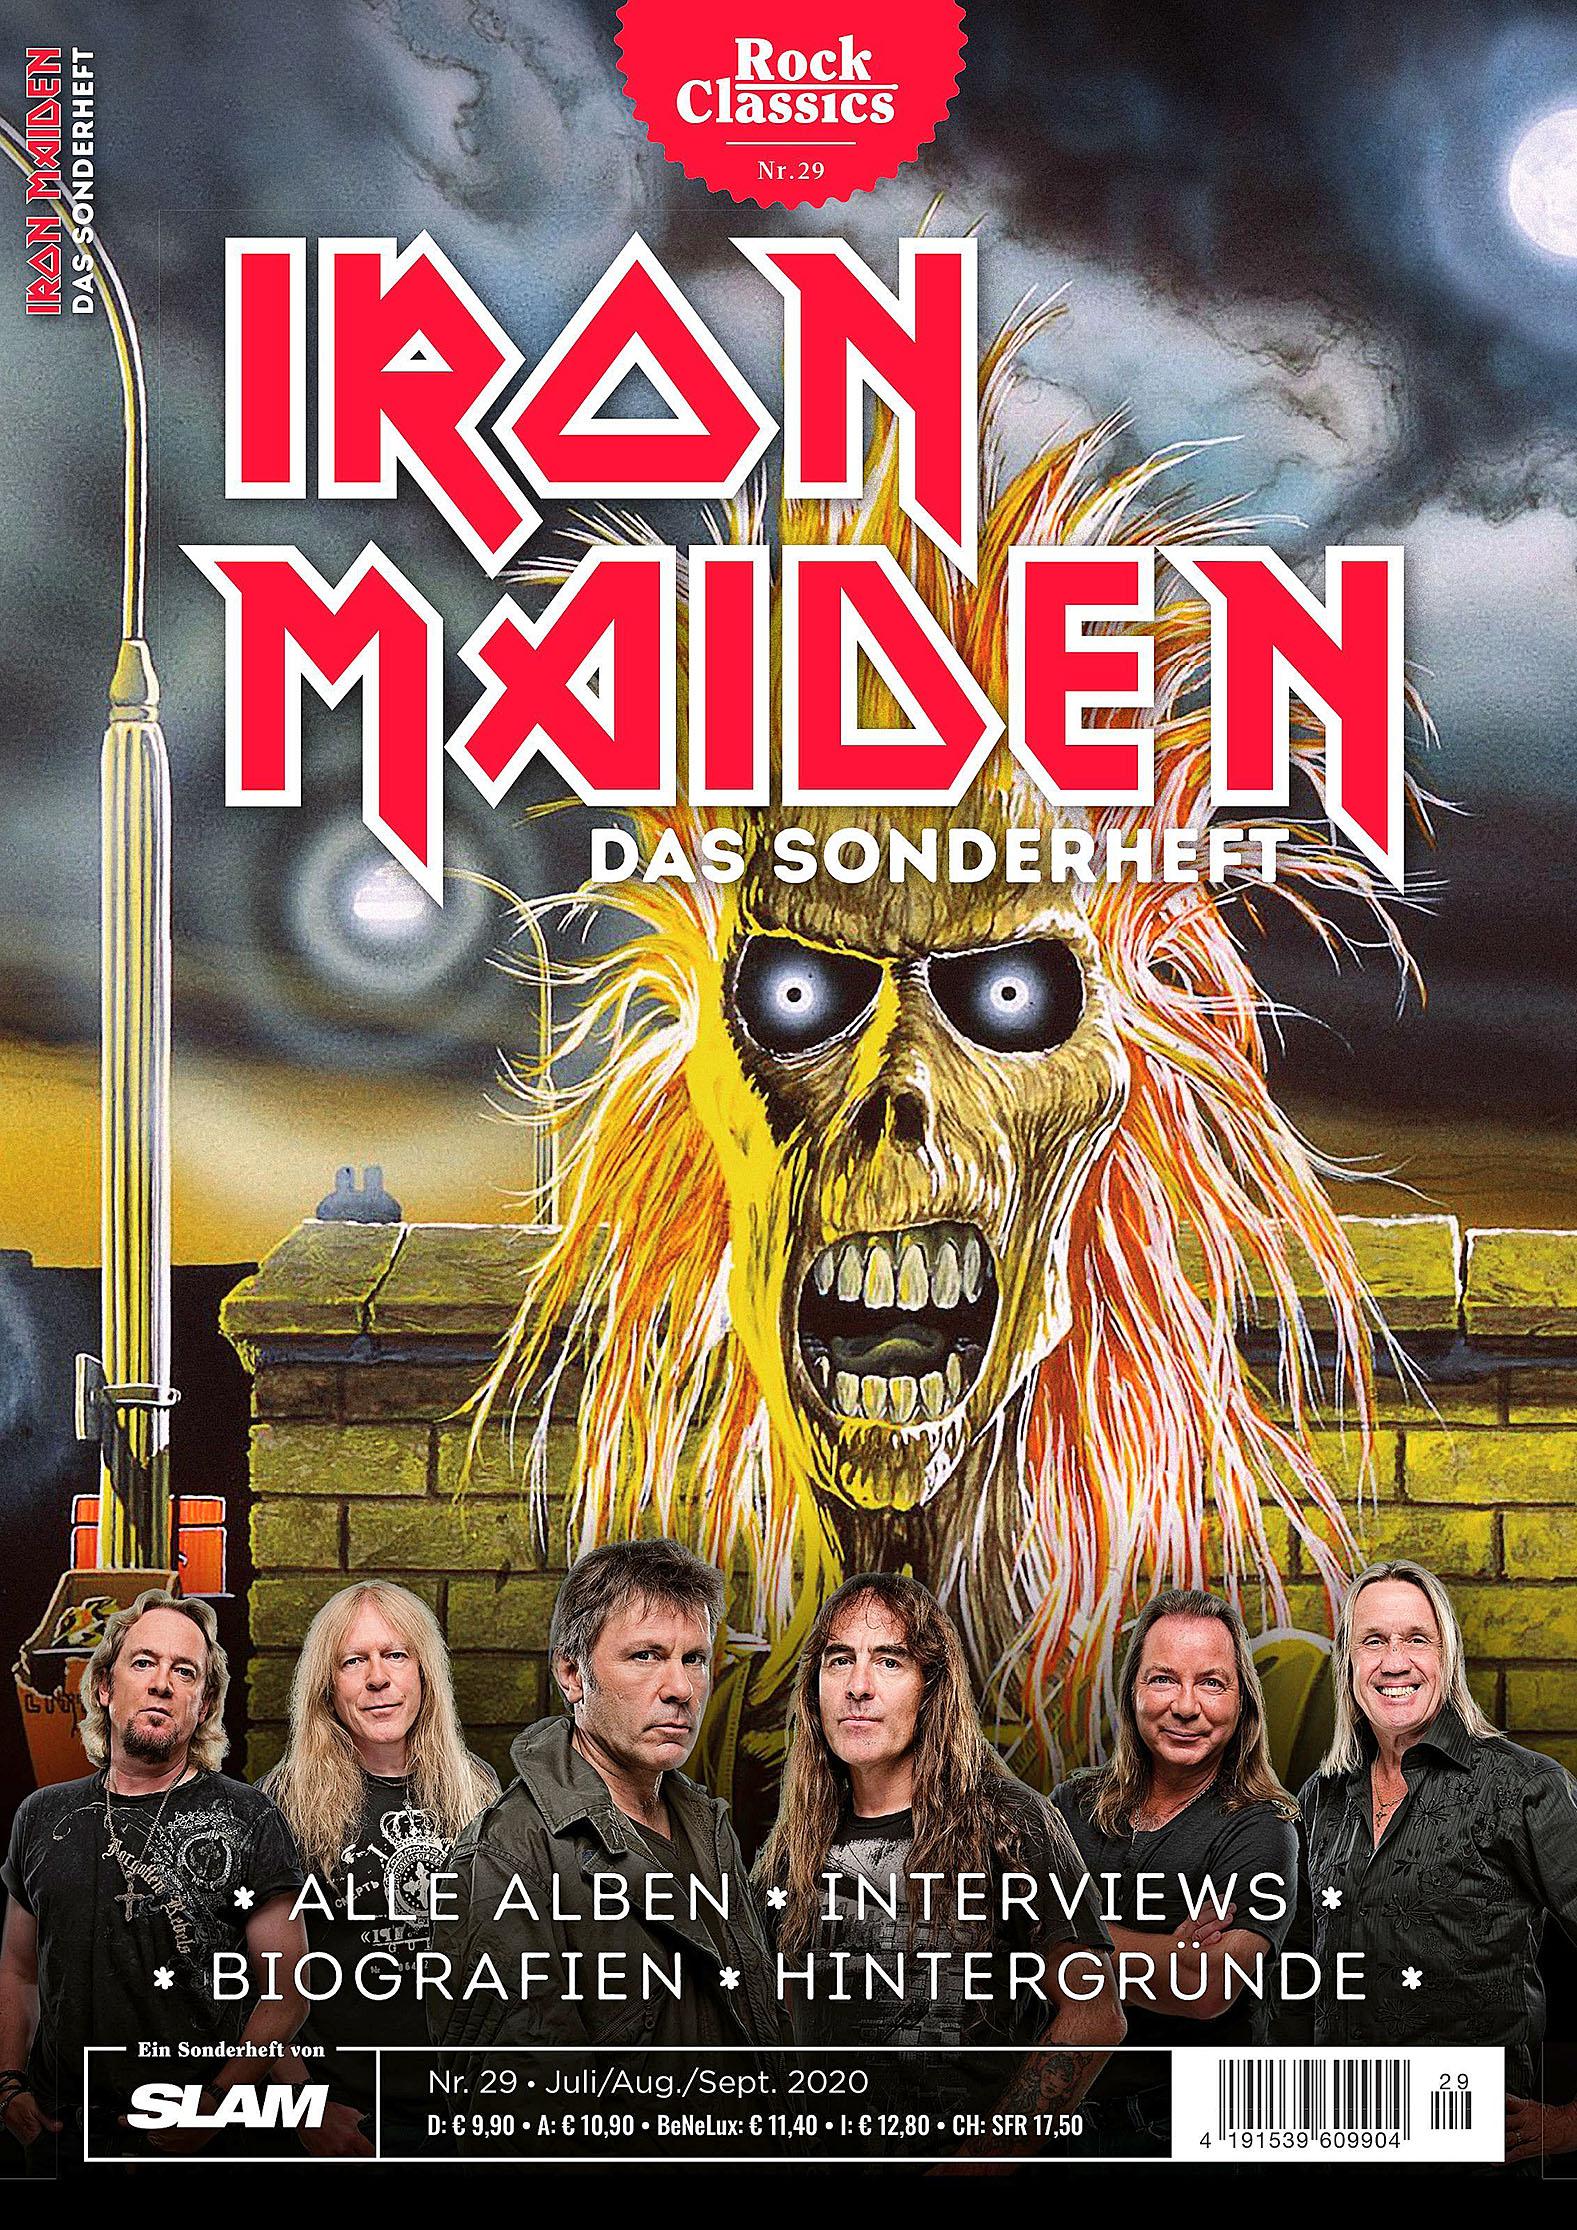 Rock Classics 29 2020-07-08-09 Iron Maiden.jpg